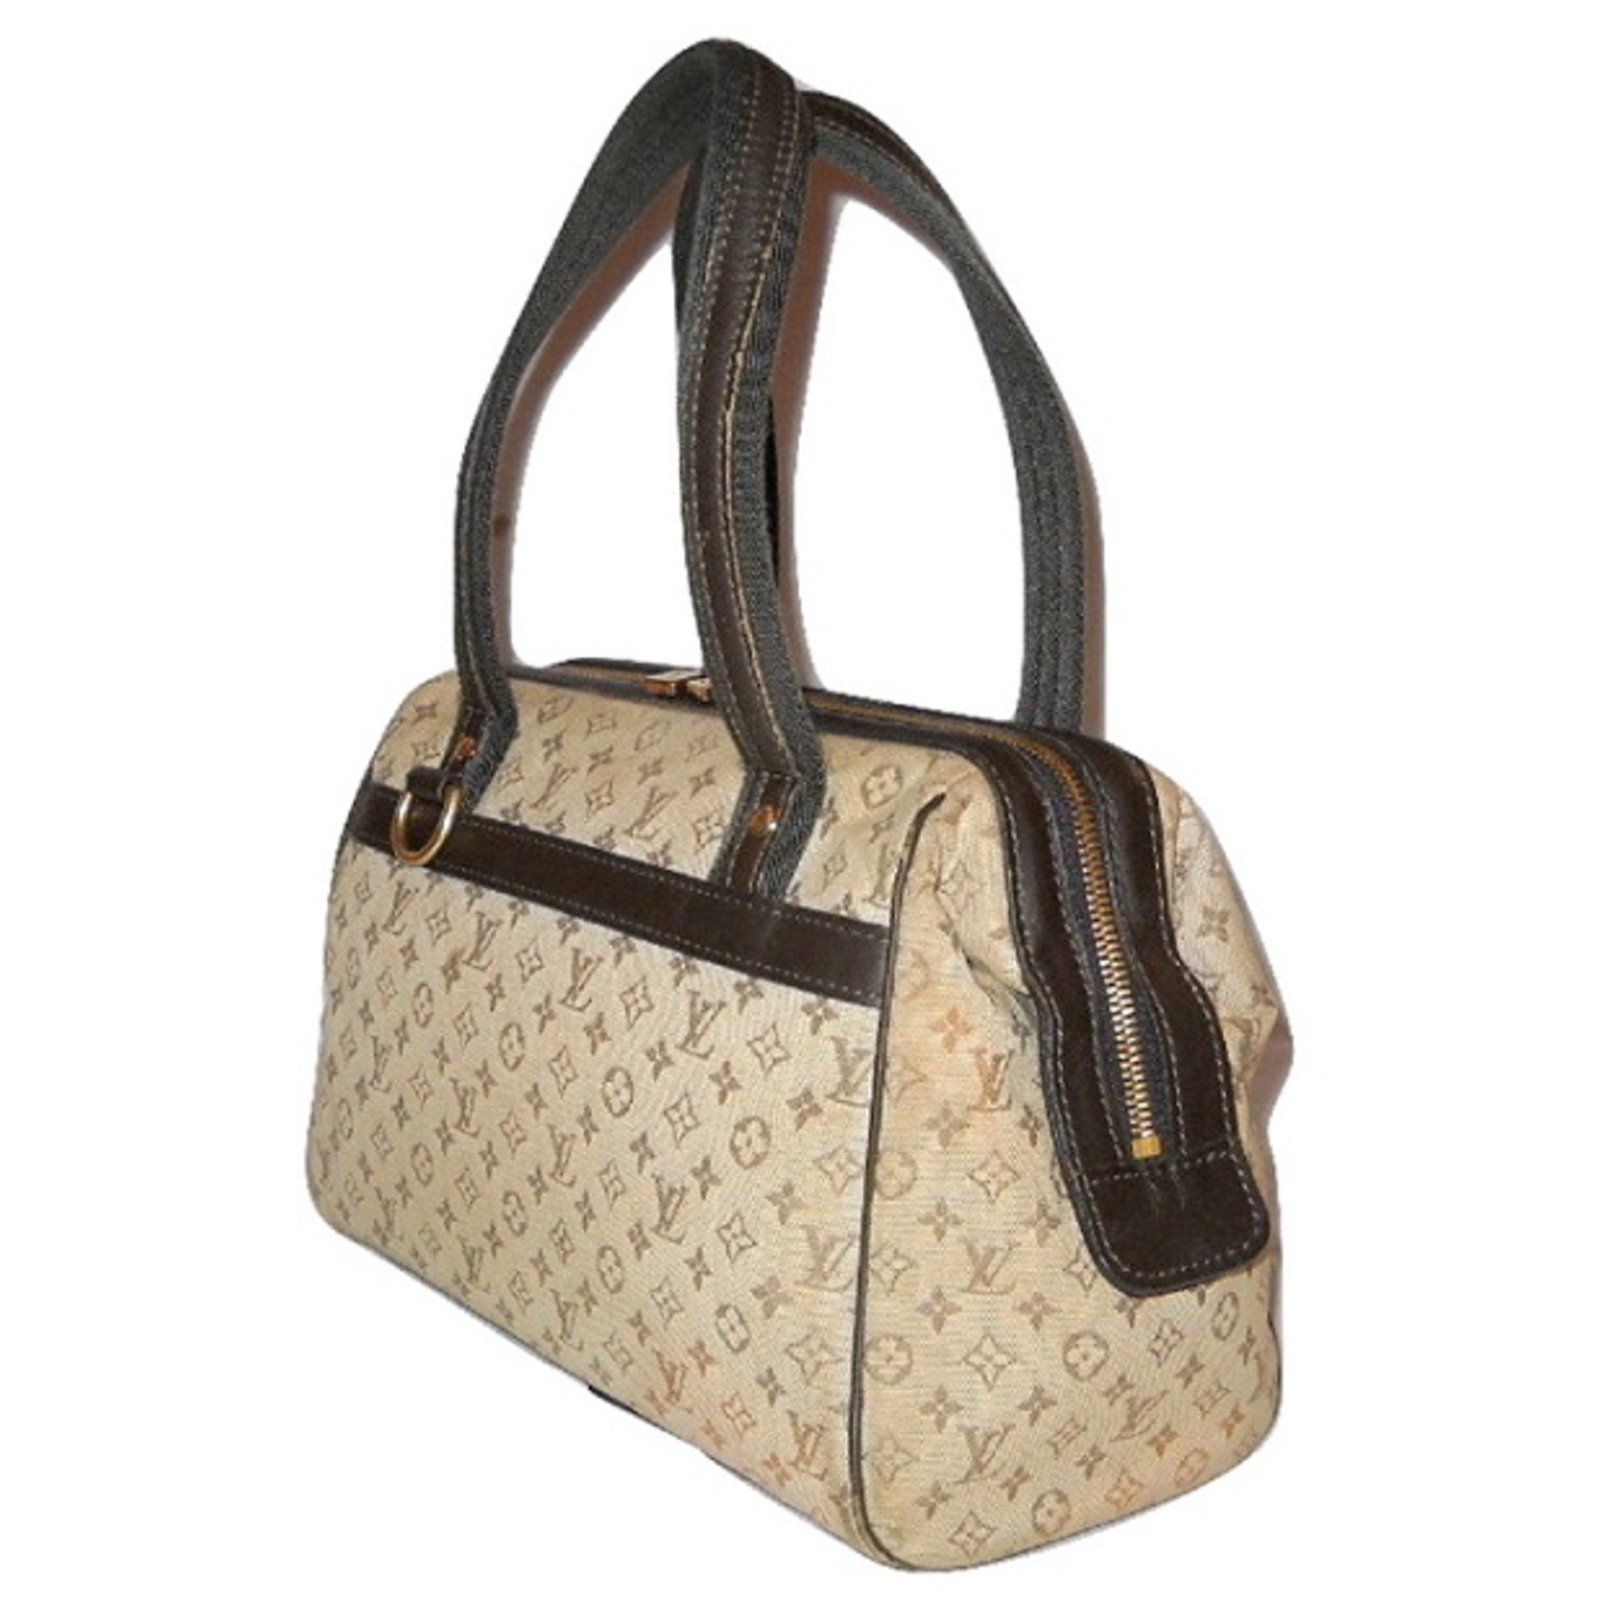 38dd20fe4 Louis Vuitton monograma do vintage Josephine PM mini Bolsas Couro,Lona  Marrom,Bege ref.52348 - Joli Closet